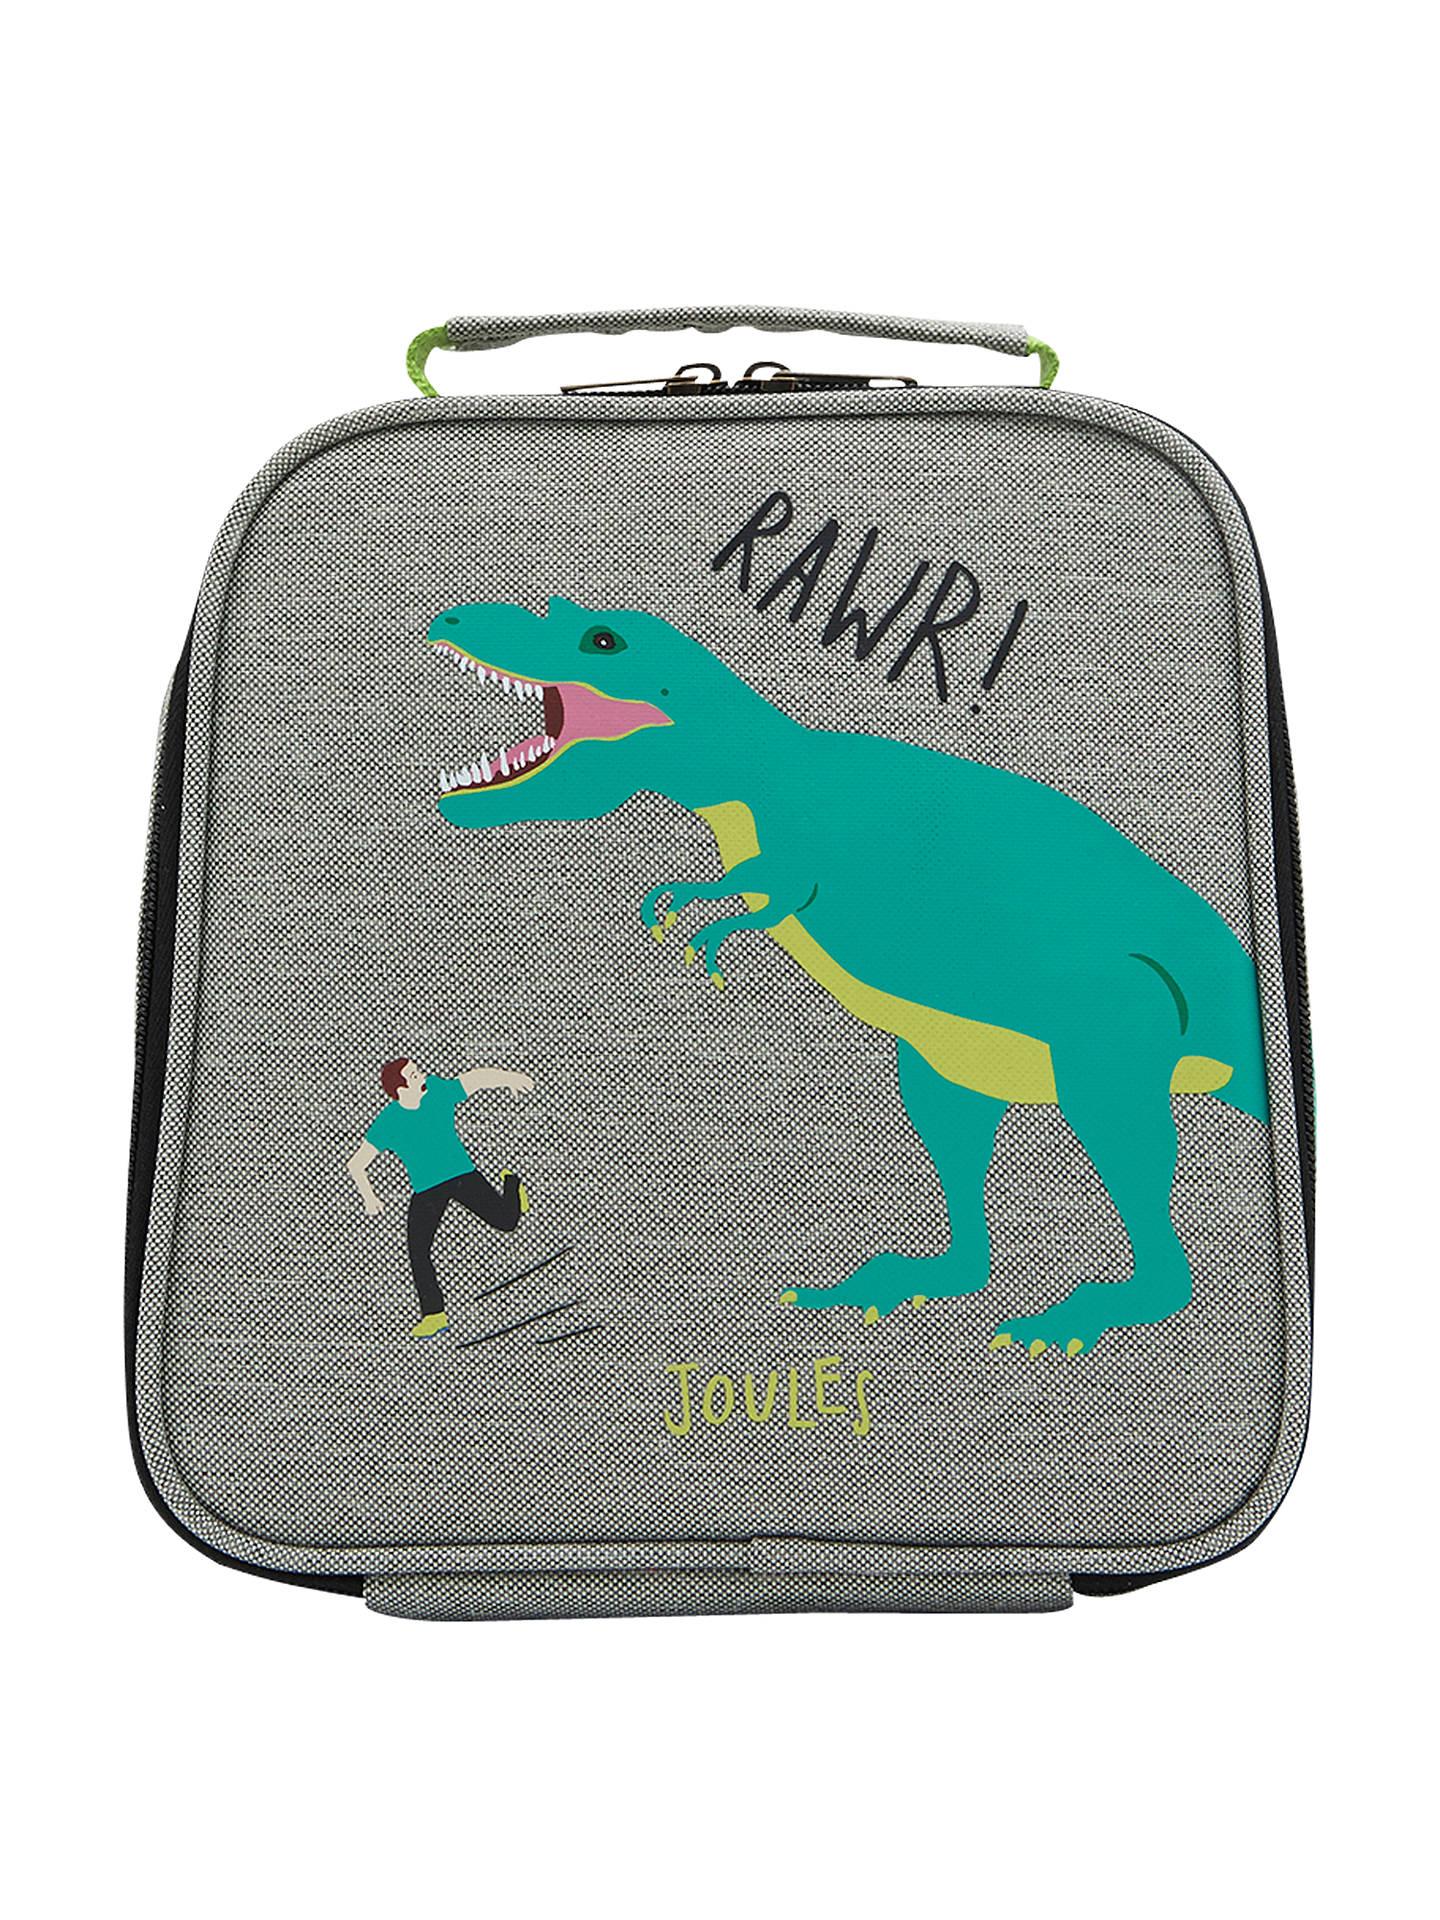 e30419337a Buy Little Joule Children's Dinosaur Print Munch Lunch Box Bag, One size,  Grey/ ...